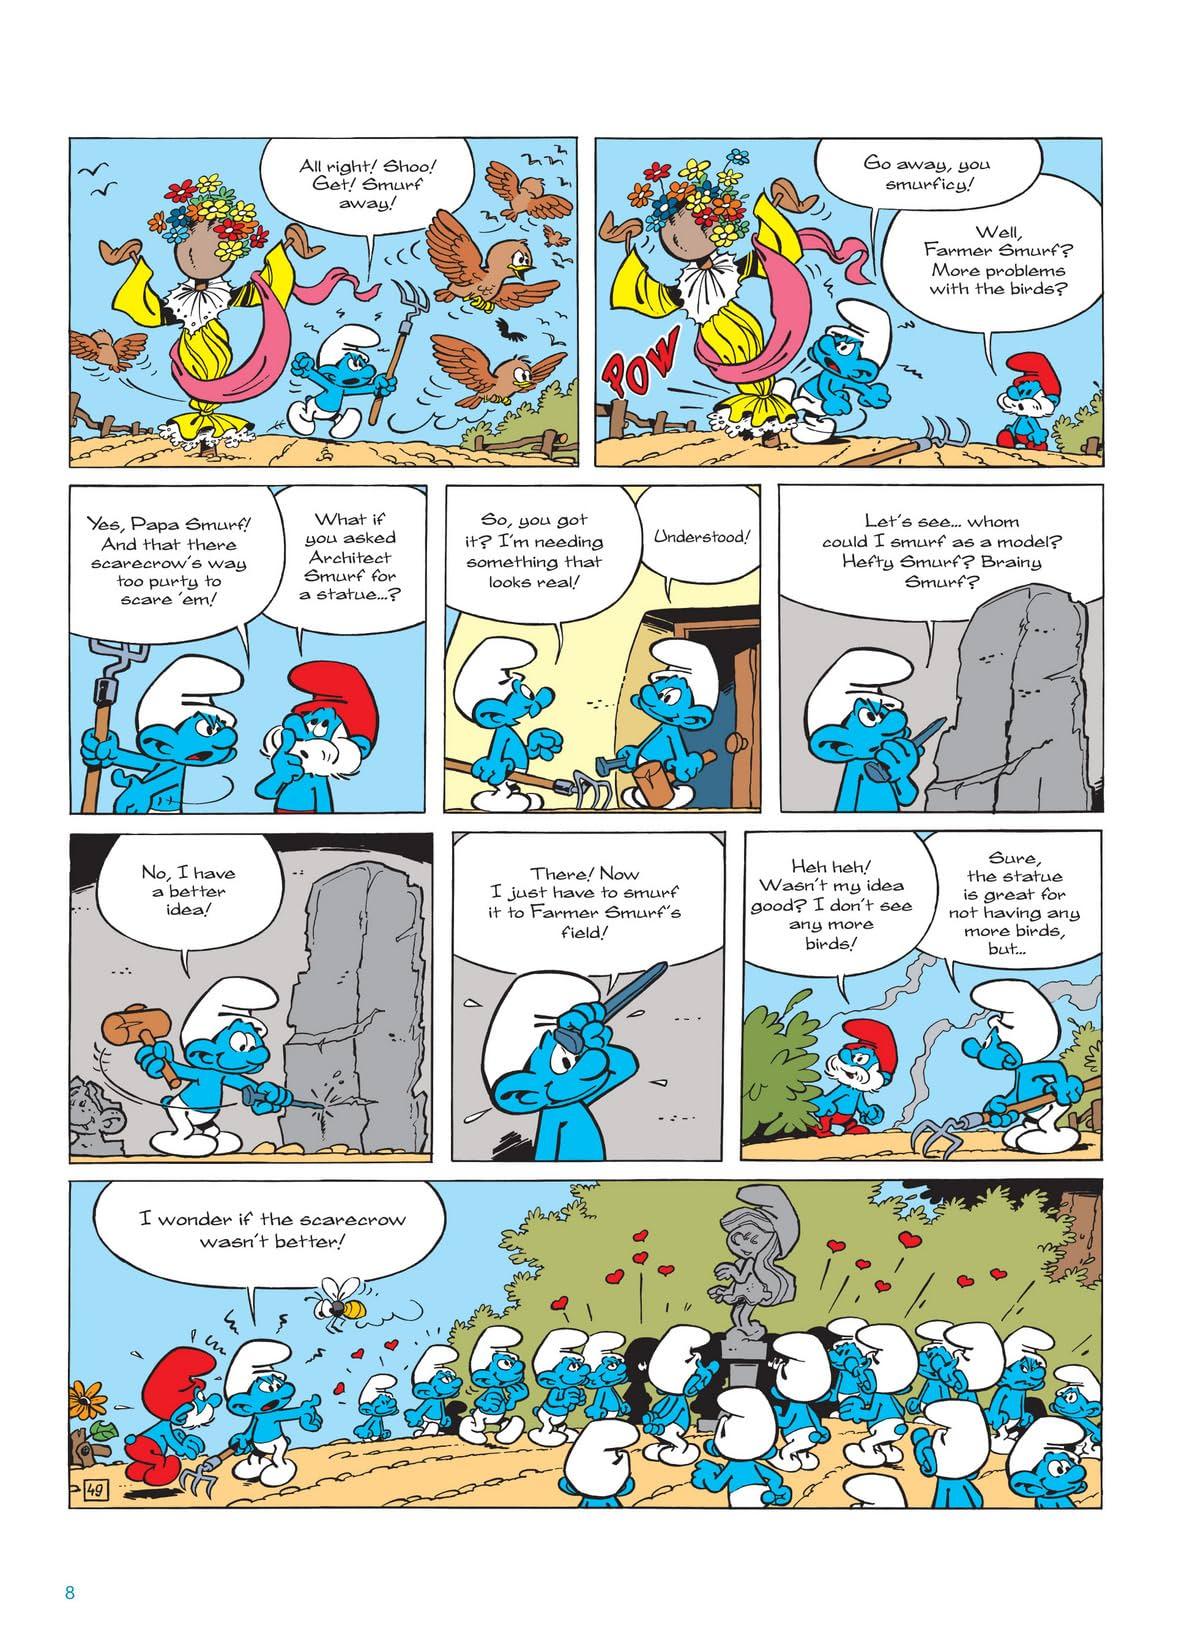 The Smurfs Vol. 10: Return of Smurfette